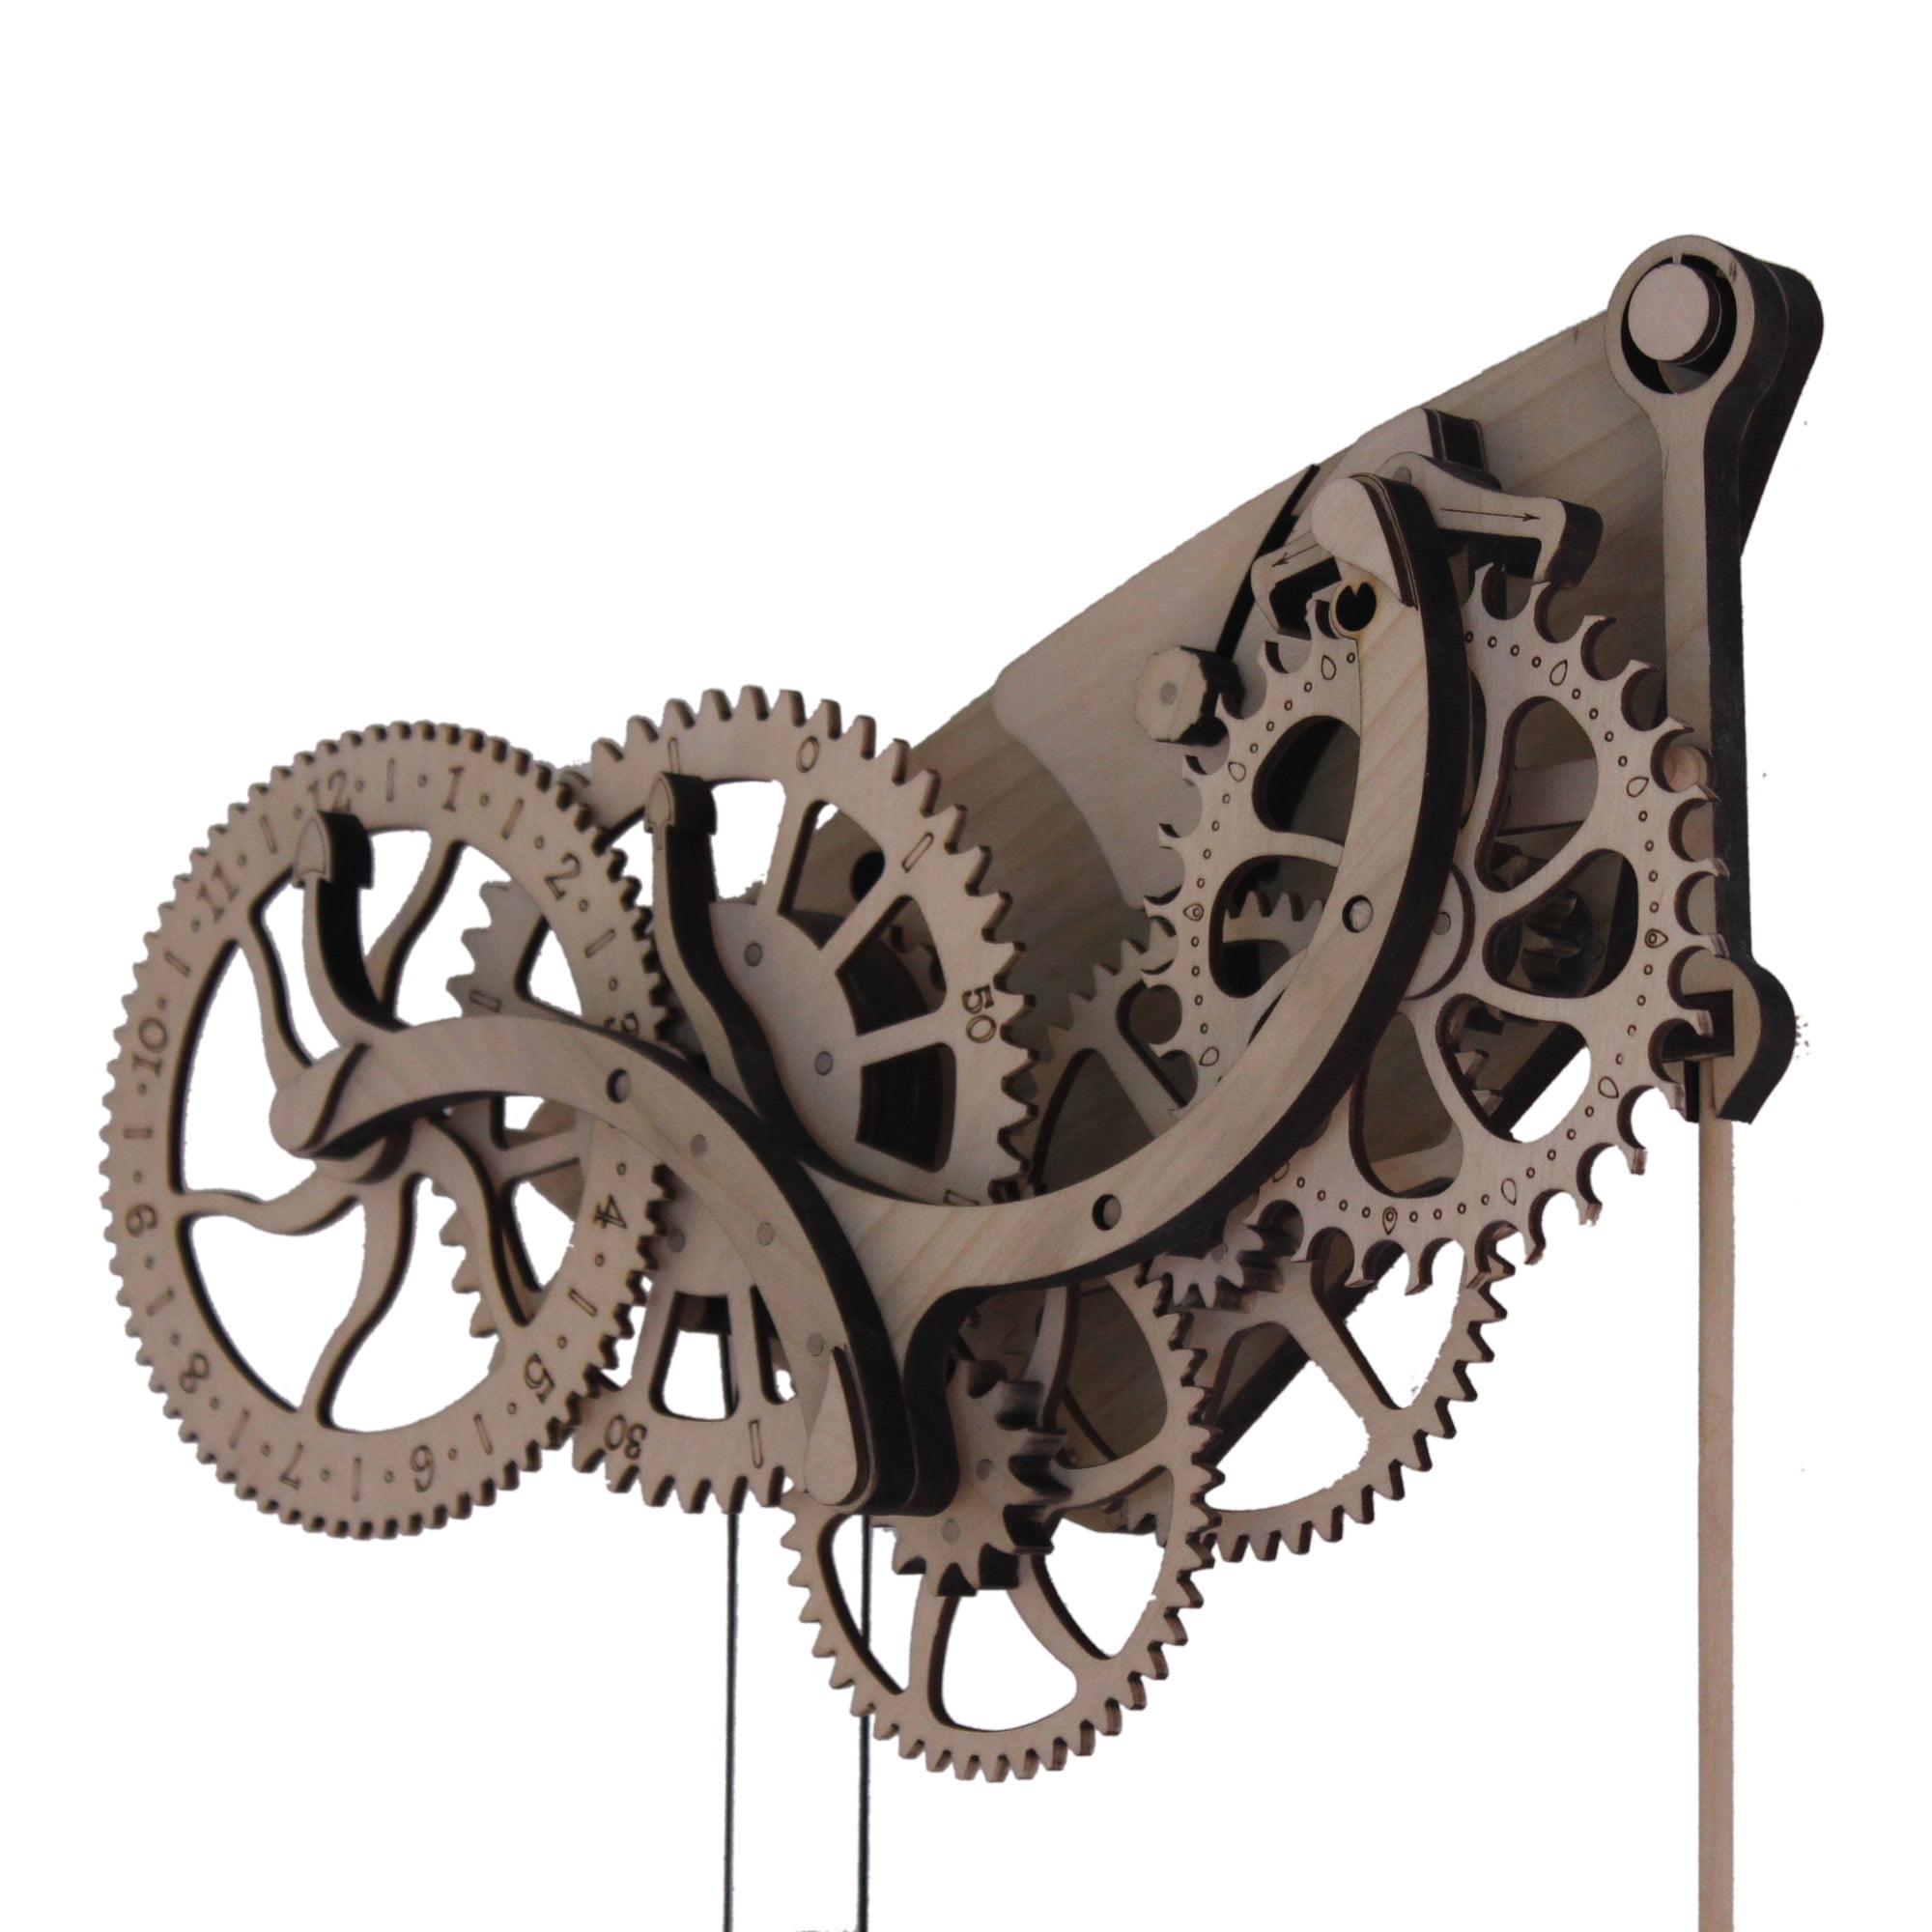 Image of Abong - Mechanical Wooden Clock Kit